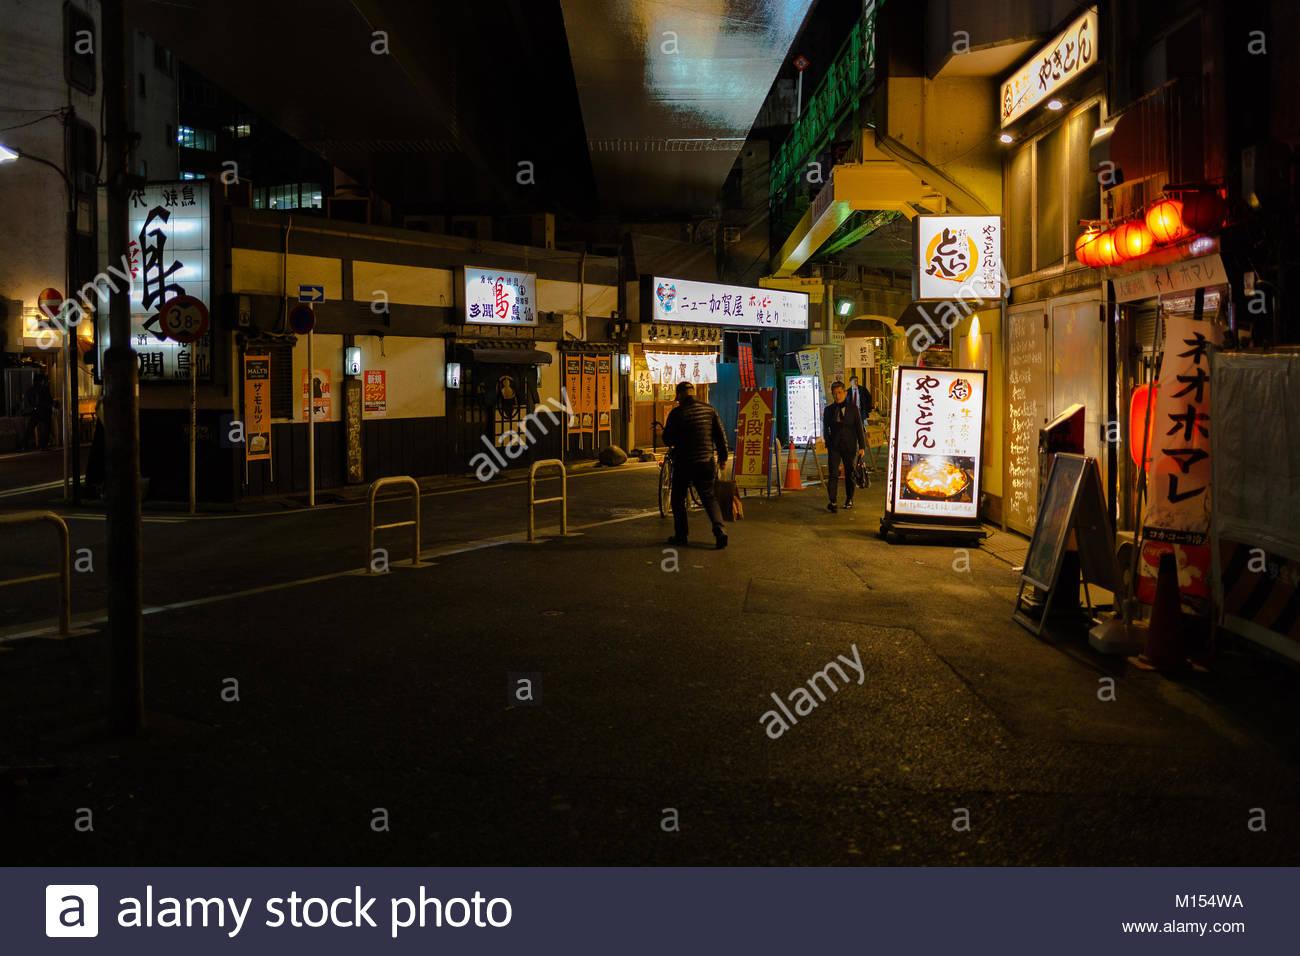 Longtime Exposure in Tokyo - Stock Image